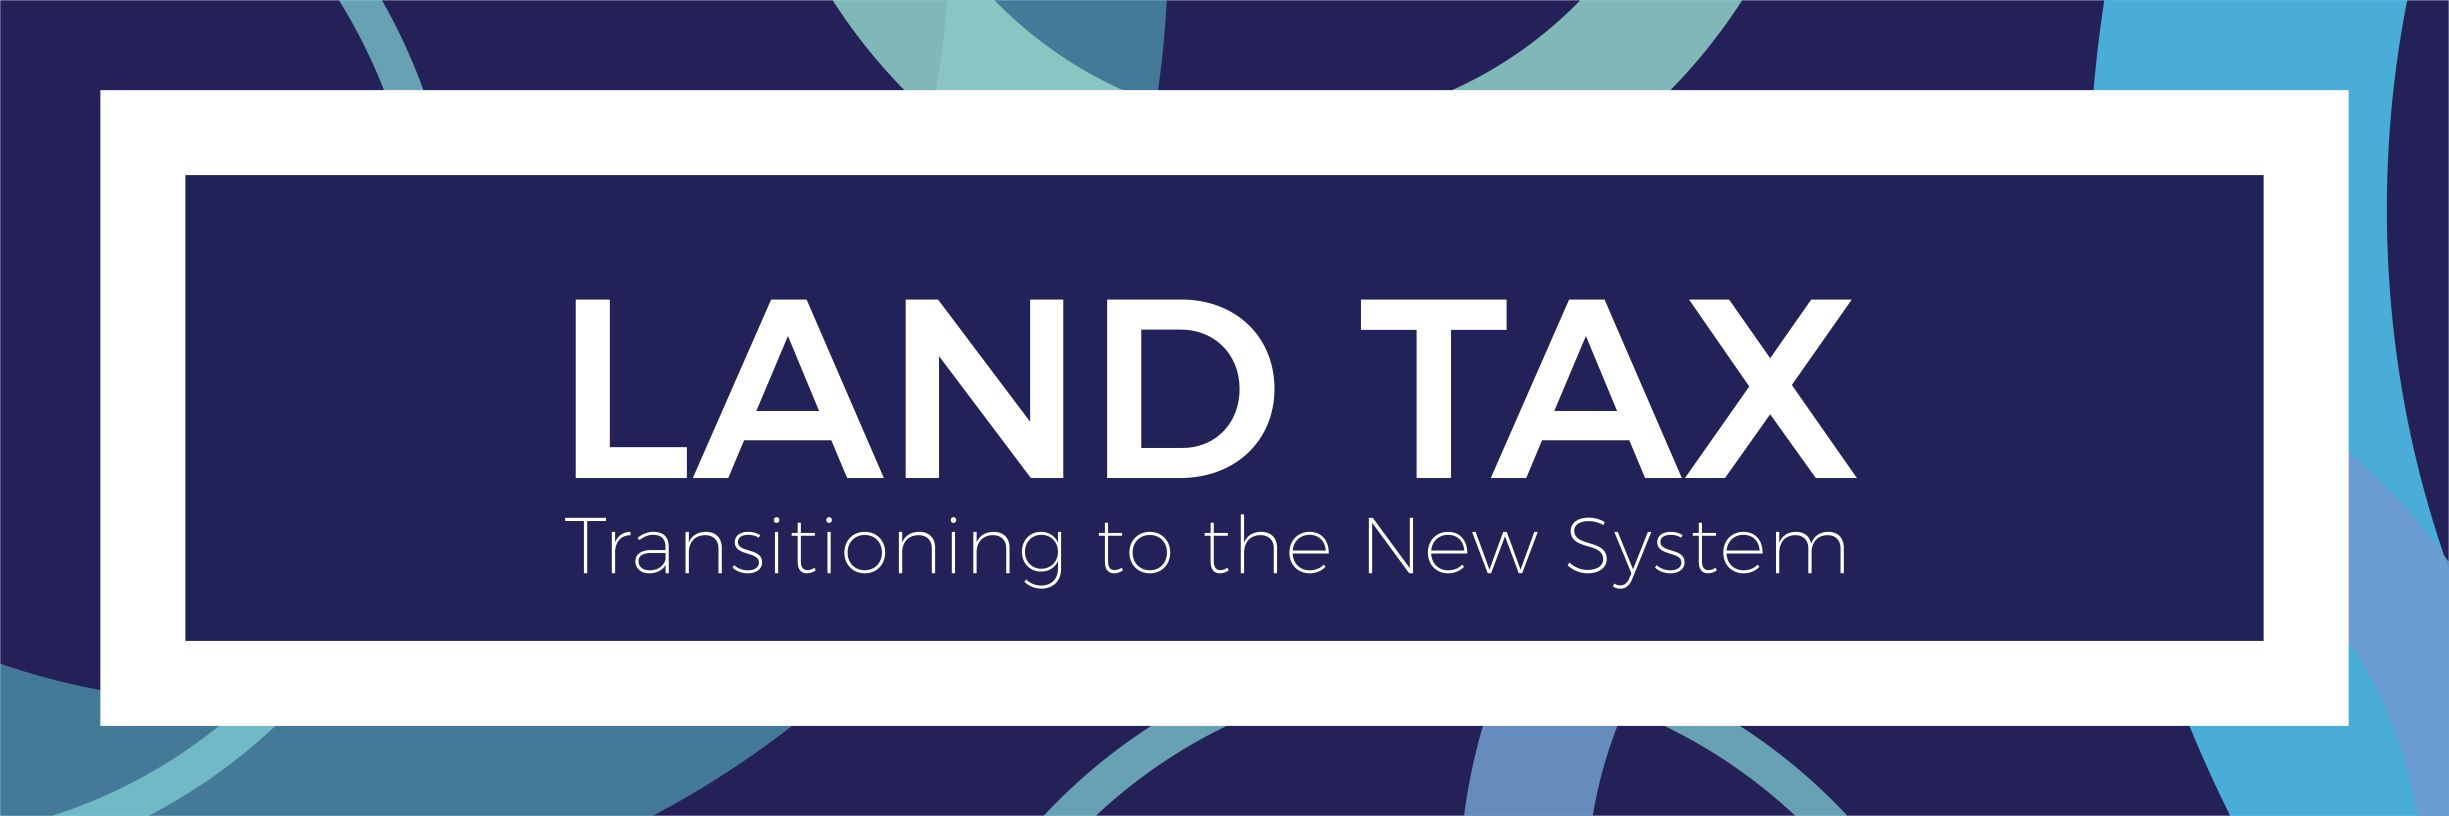 New Land Tax Banner